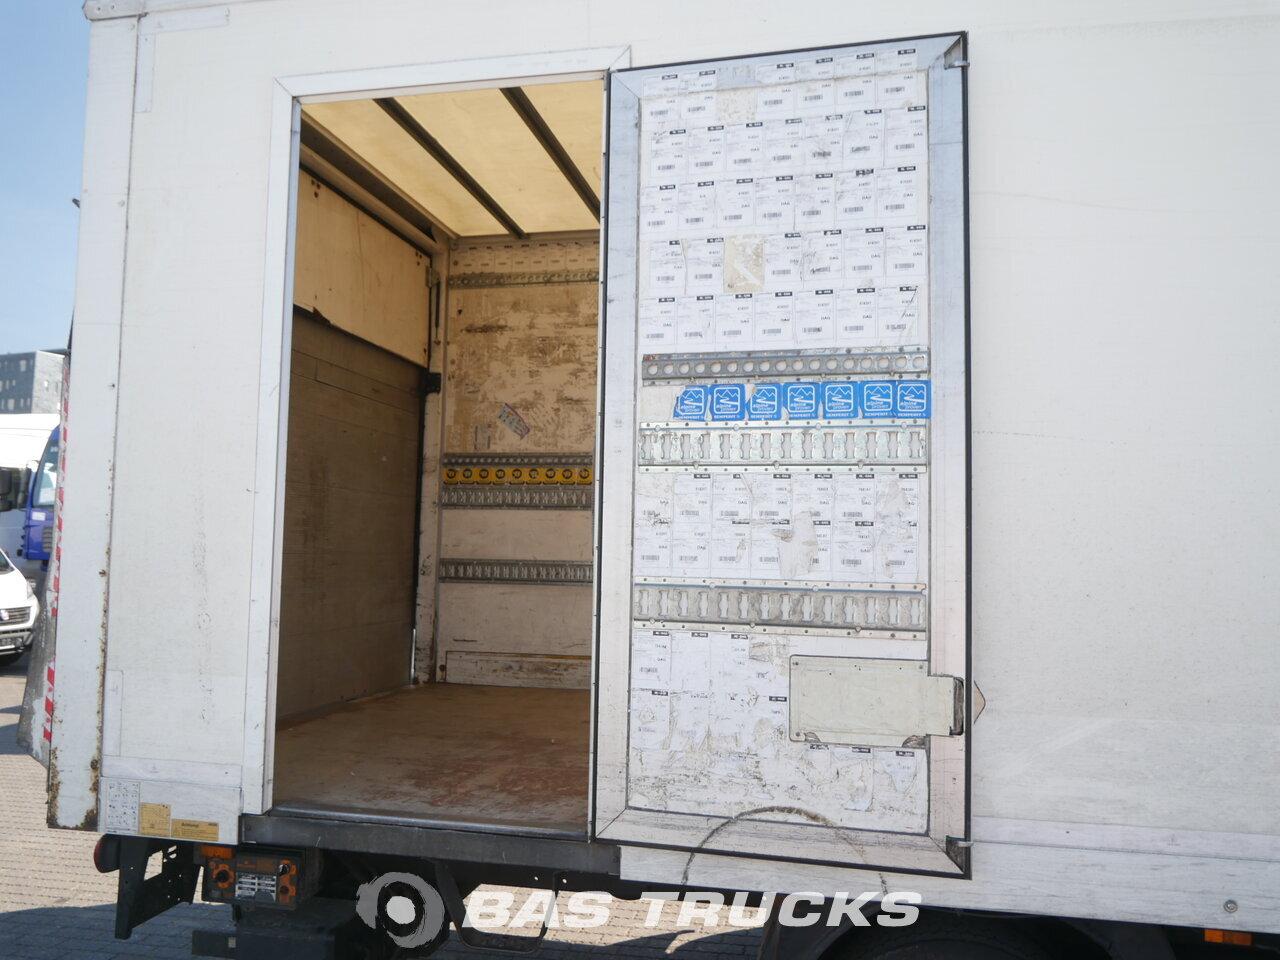 For sale at BAS Trucks: DAF LF45 160 GEARBOX PROBLEM 4X2 01/2009